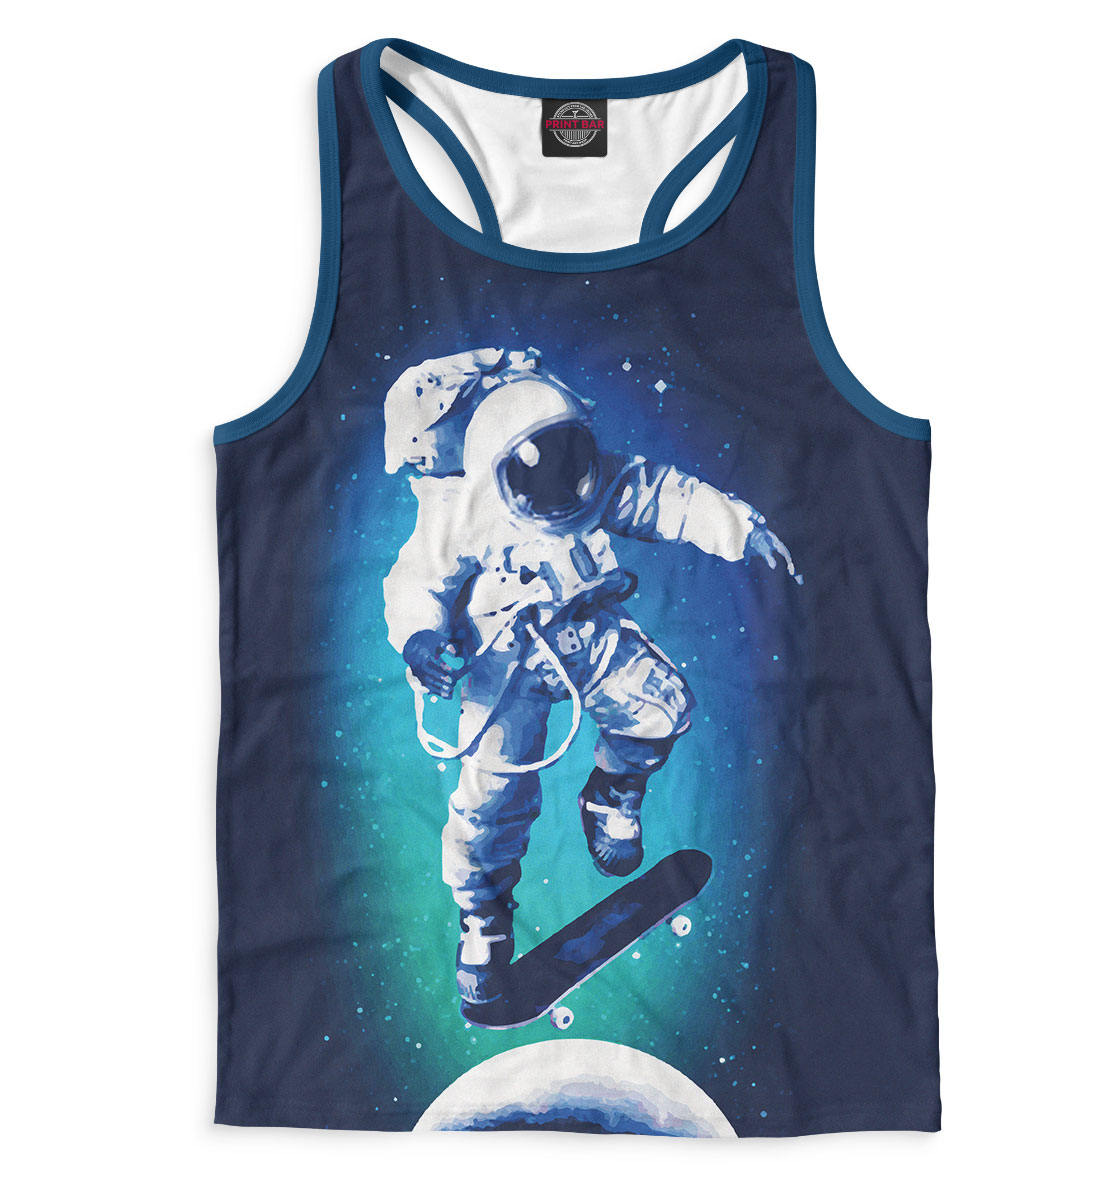 Купить Космонавт-скейтер, Printbar, Майки борцовки, SKT-954816-mayb-2